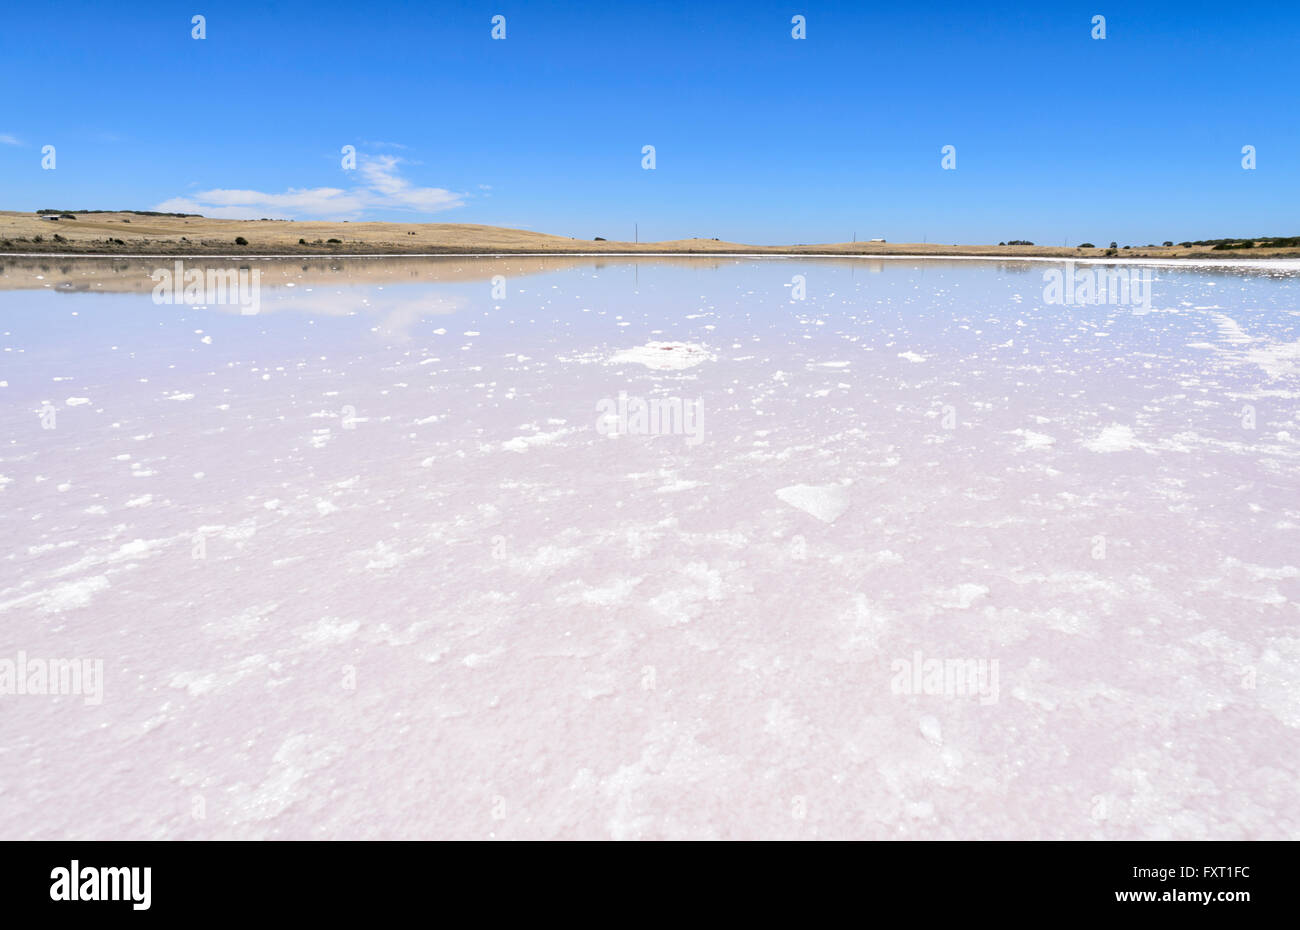 Saltpan near Parnka Point, the Coorong National Park, Fleurieu Peninsula, South Australia, SA, Australia Stock Photo